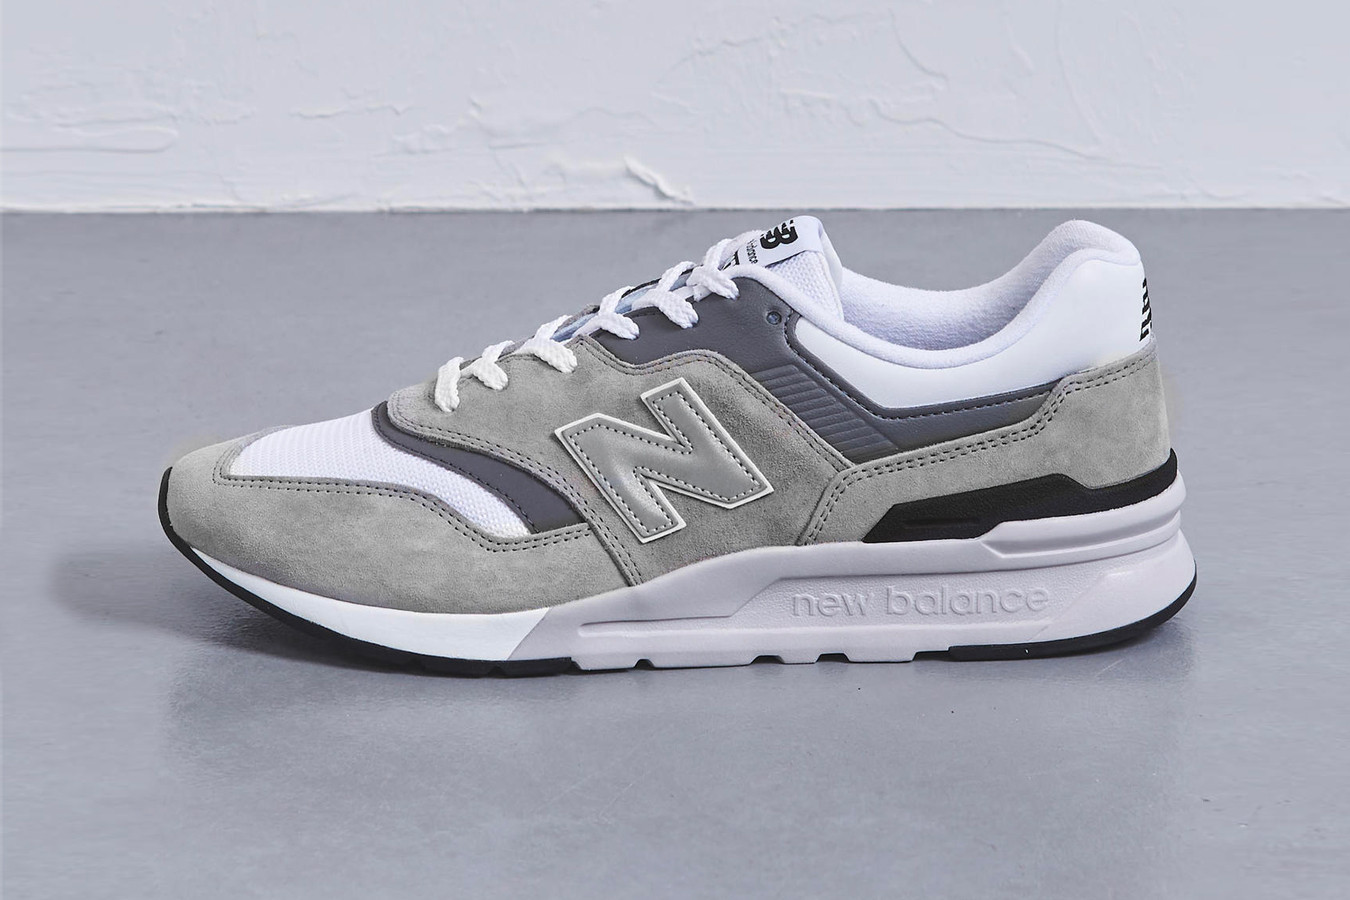 new balance 997h grey